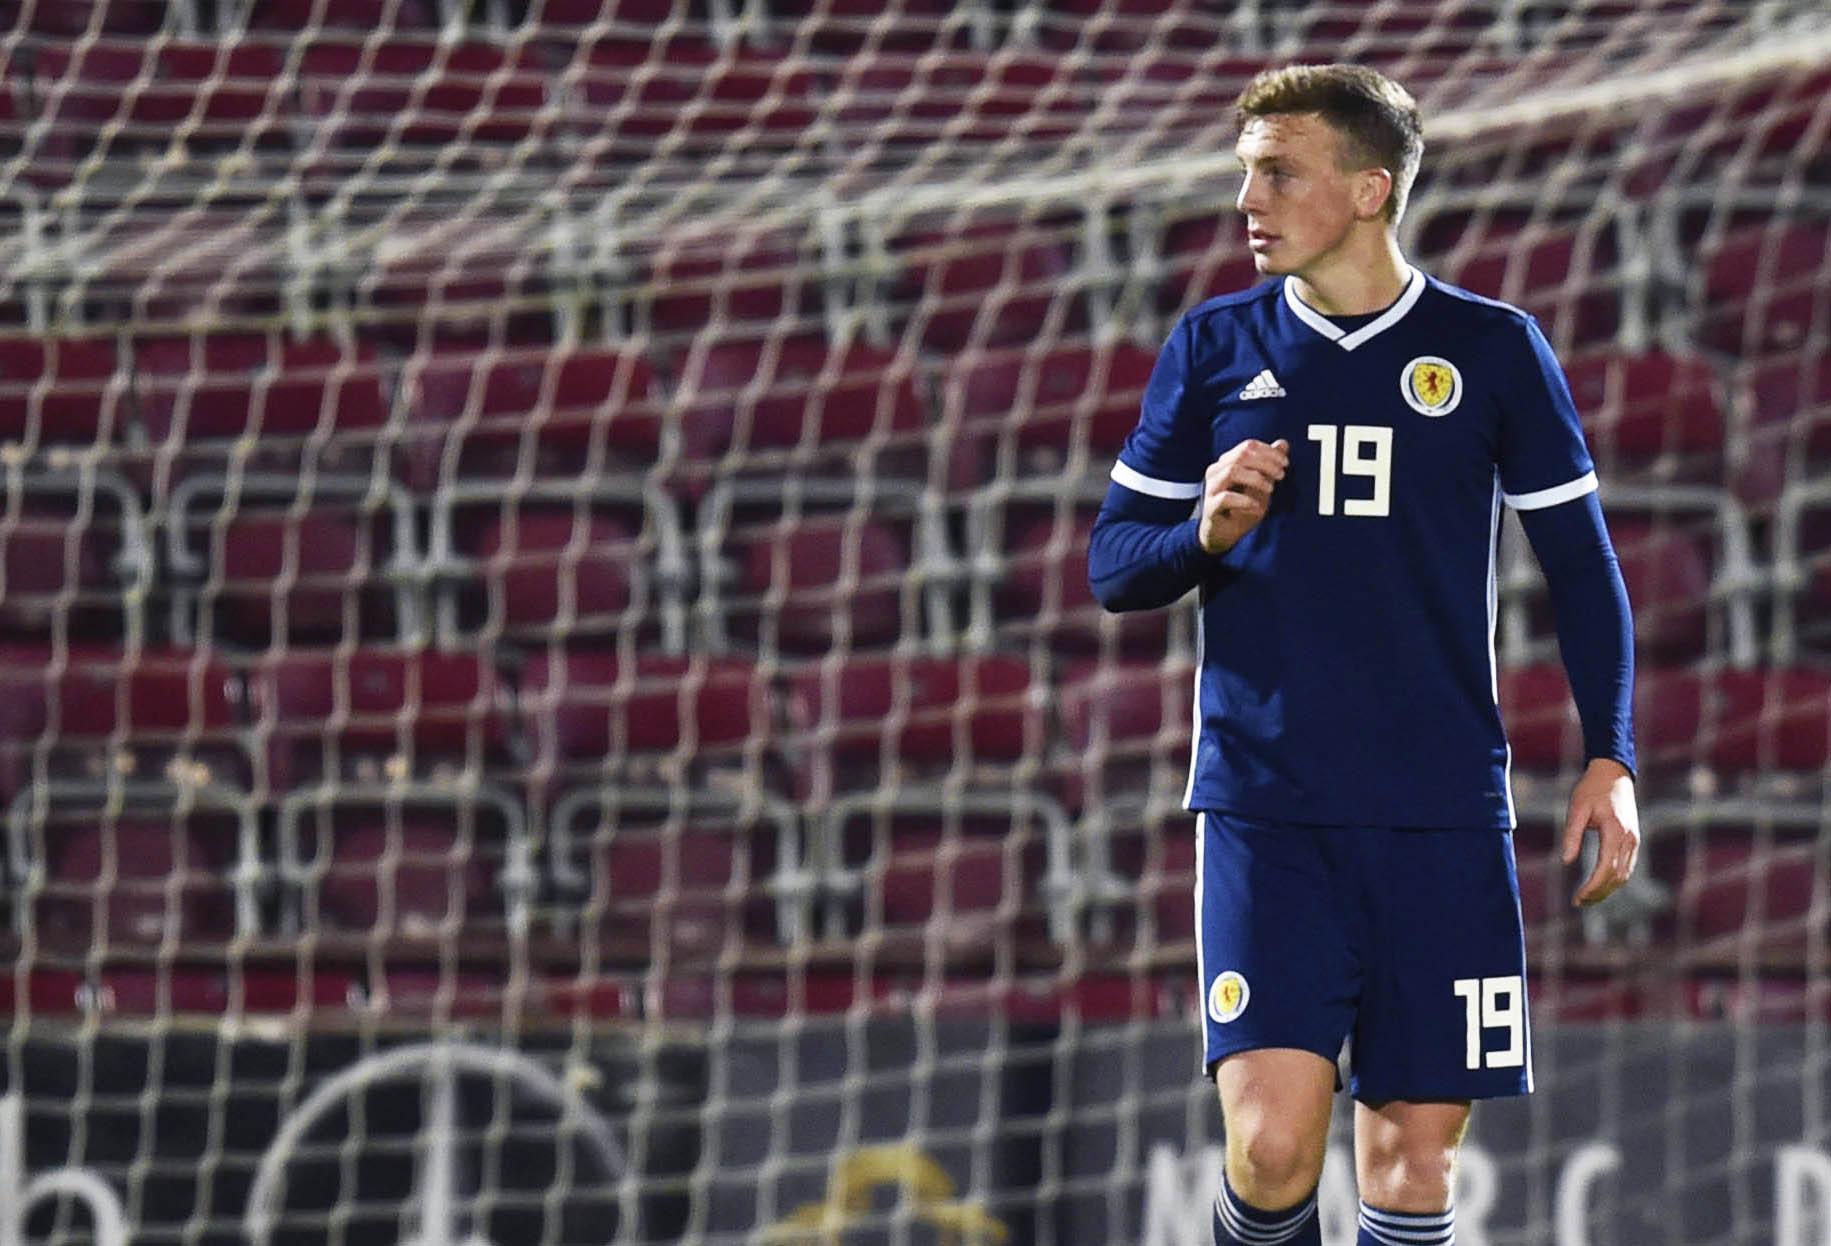 Scotland's Lewis Ferguson is pictured looking dejected.